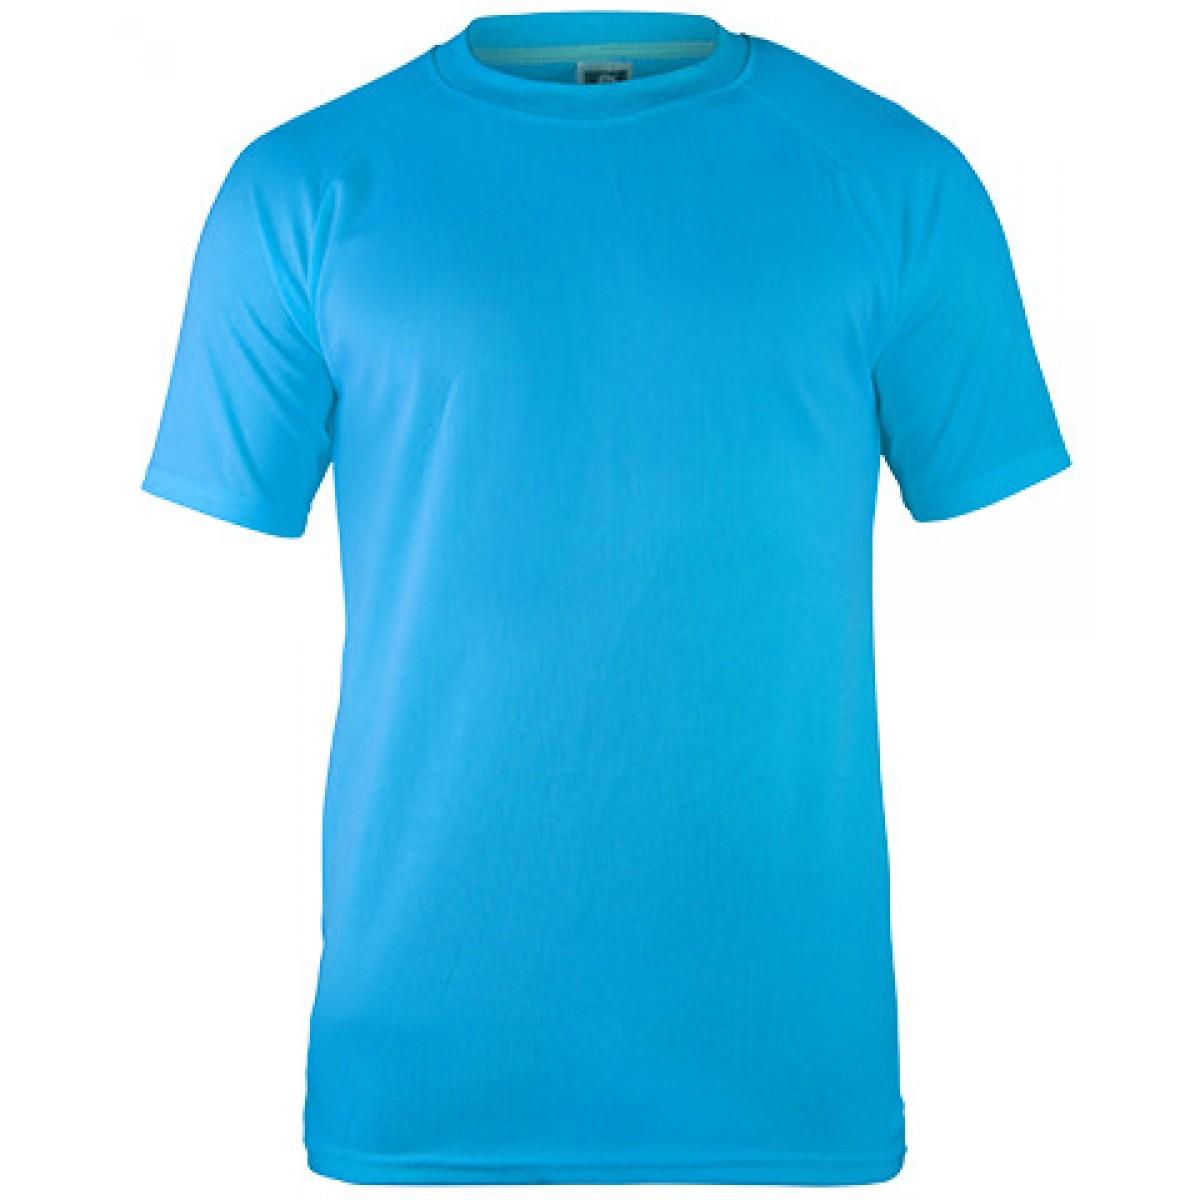 Short Sleeves Mesh Performance T-shirt-Blue-S